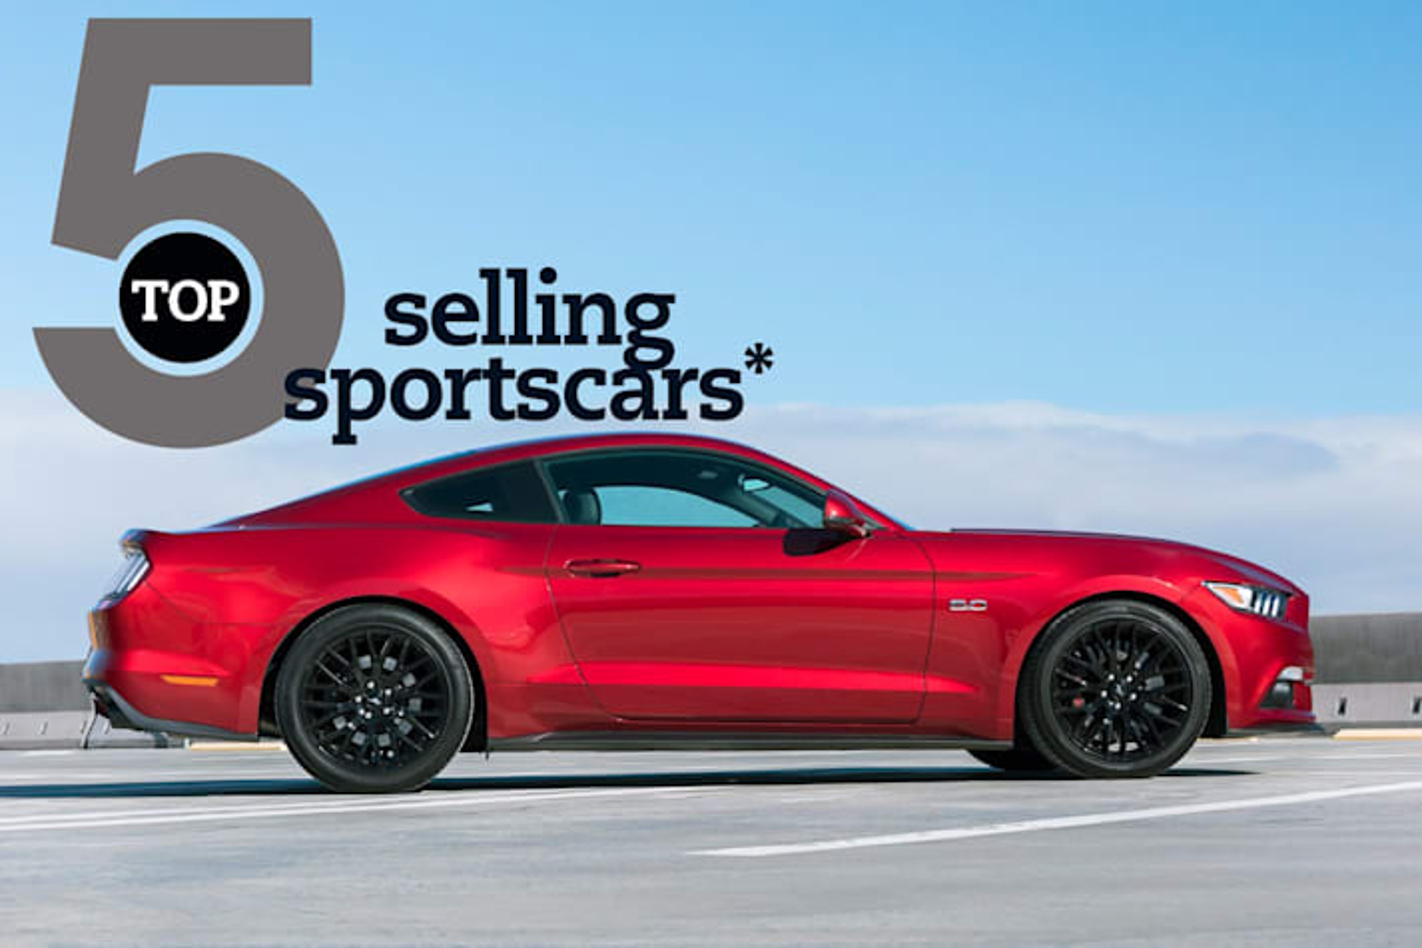 Top 5: Best-selling sportscars